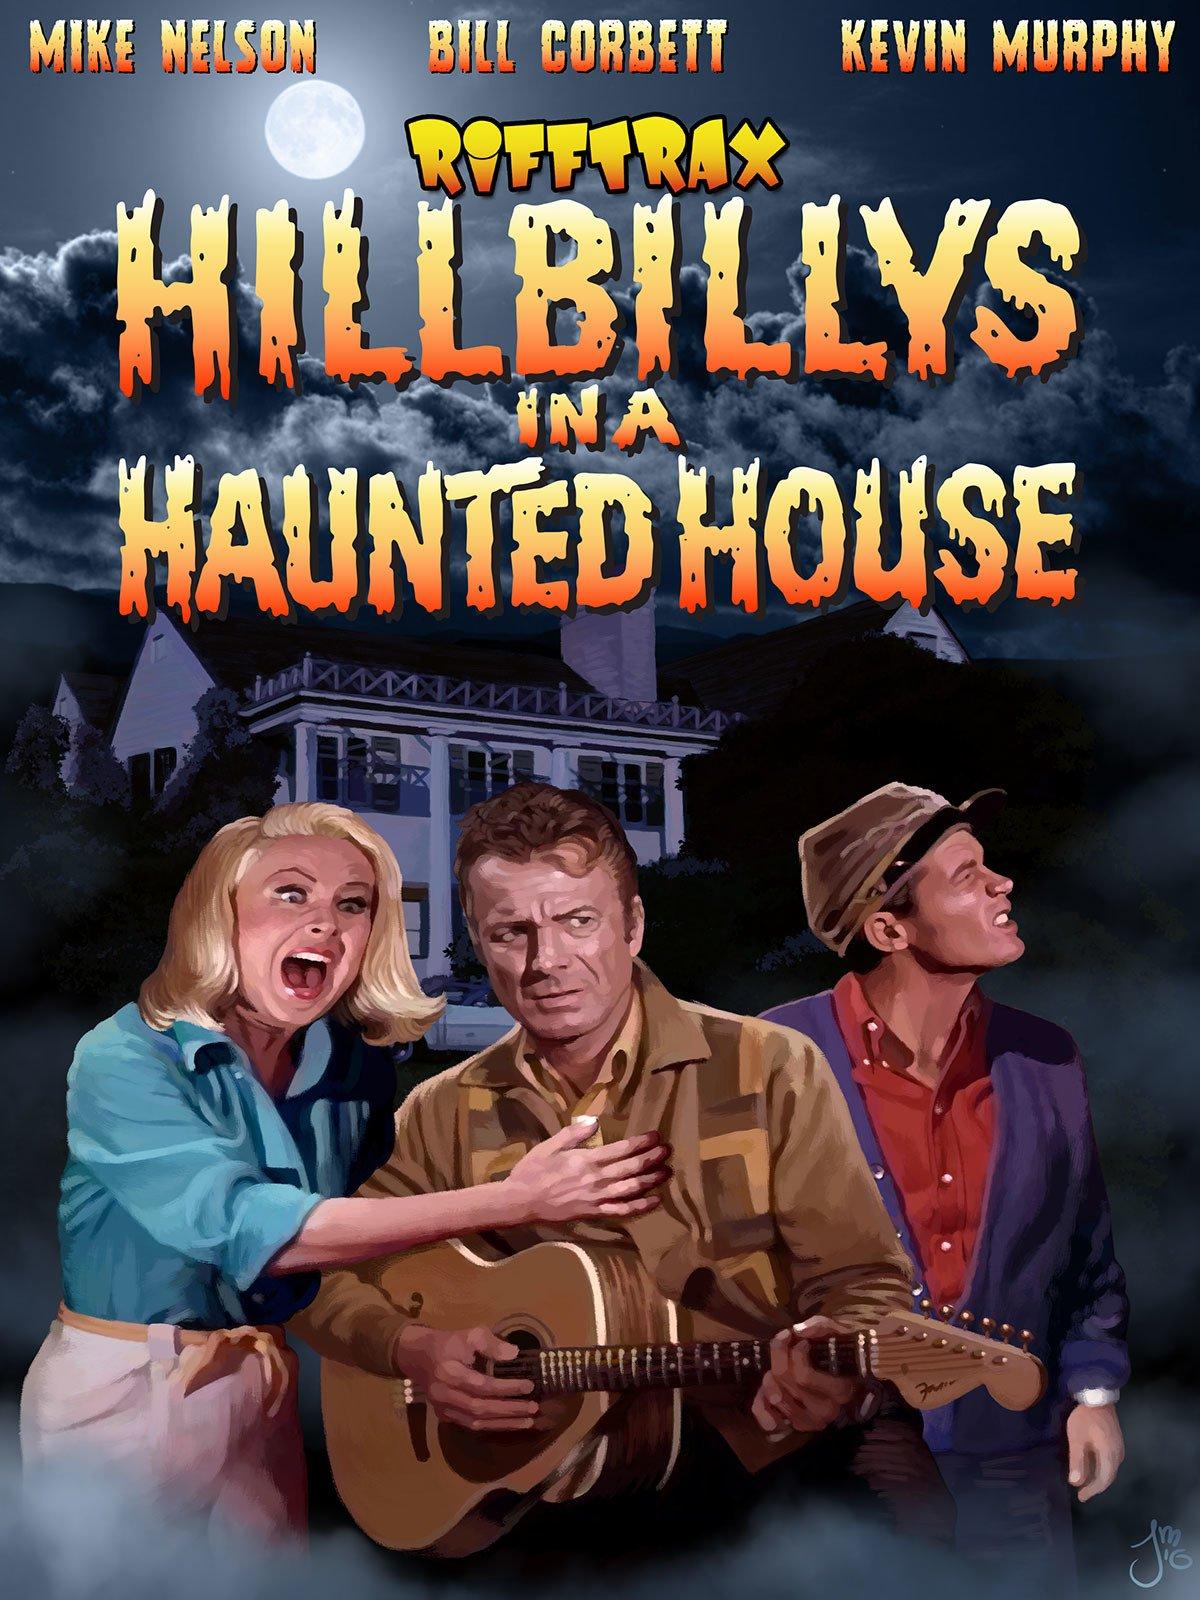 RiffTrax: Hillbillys in a Haunted House